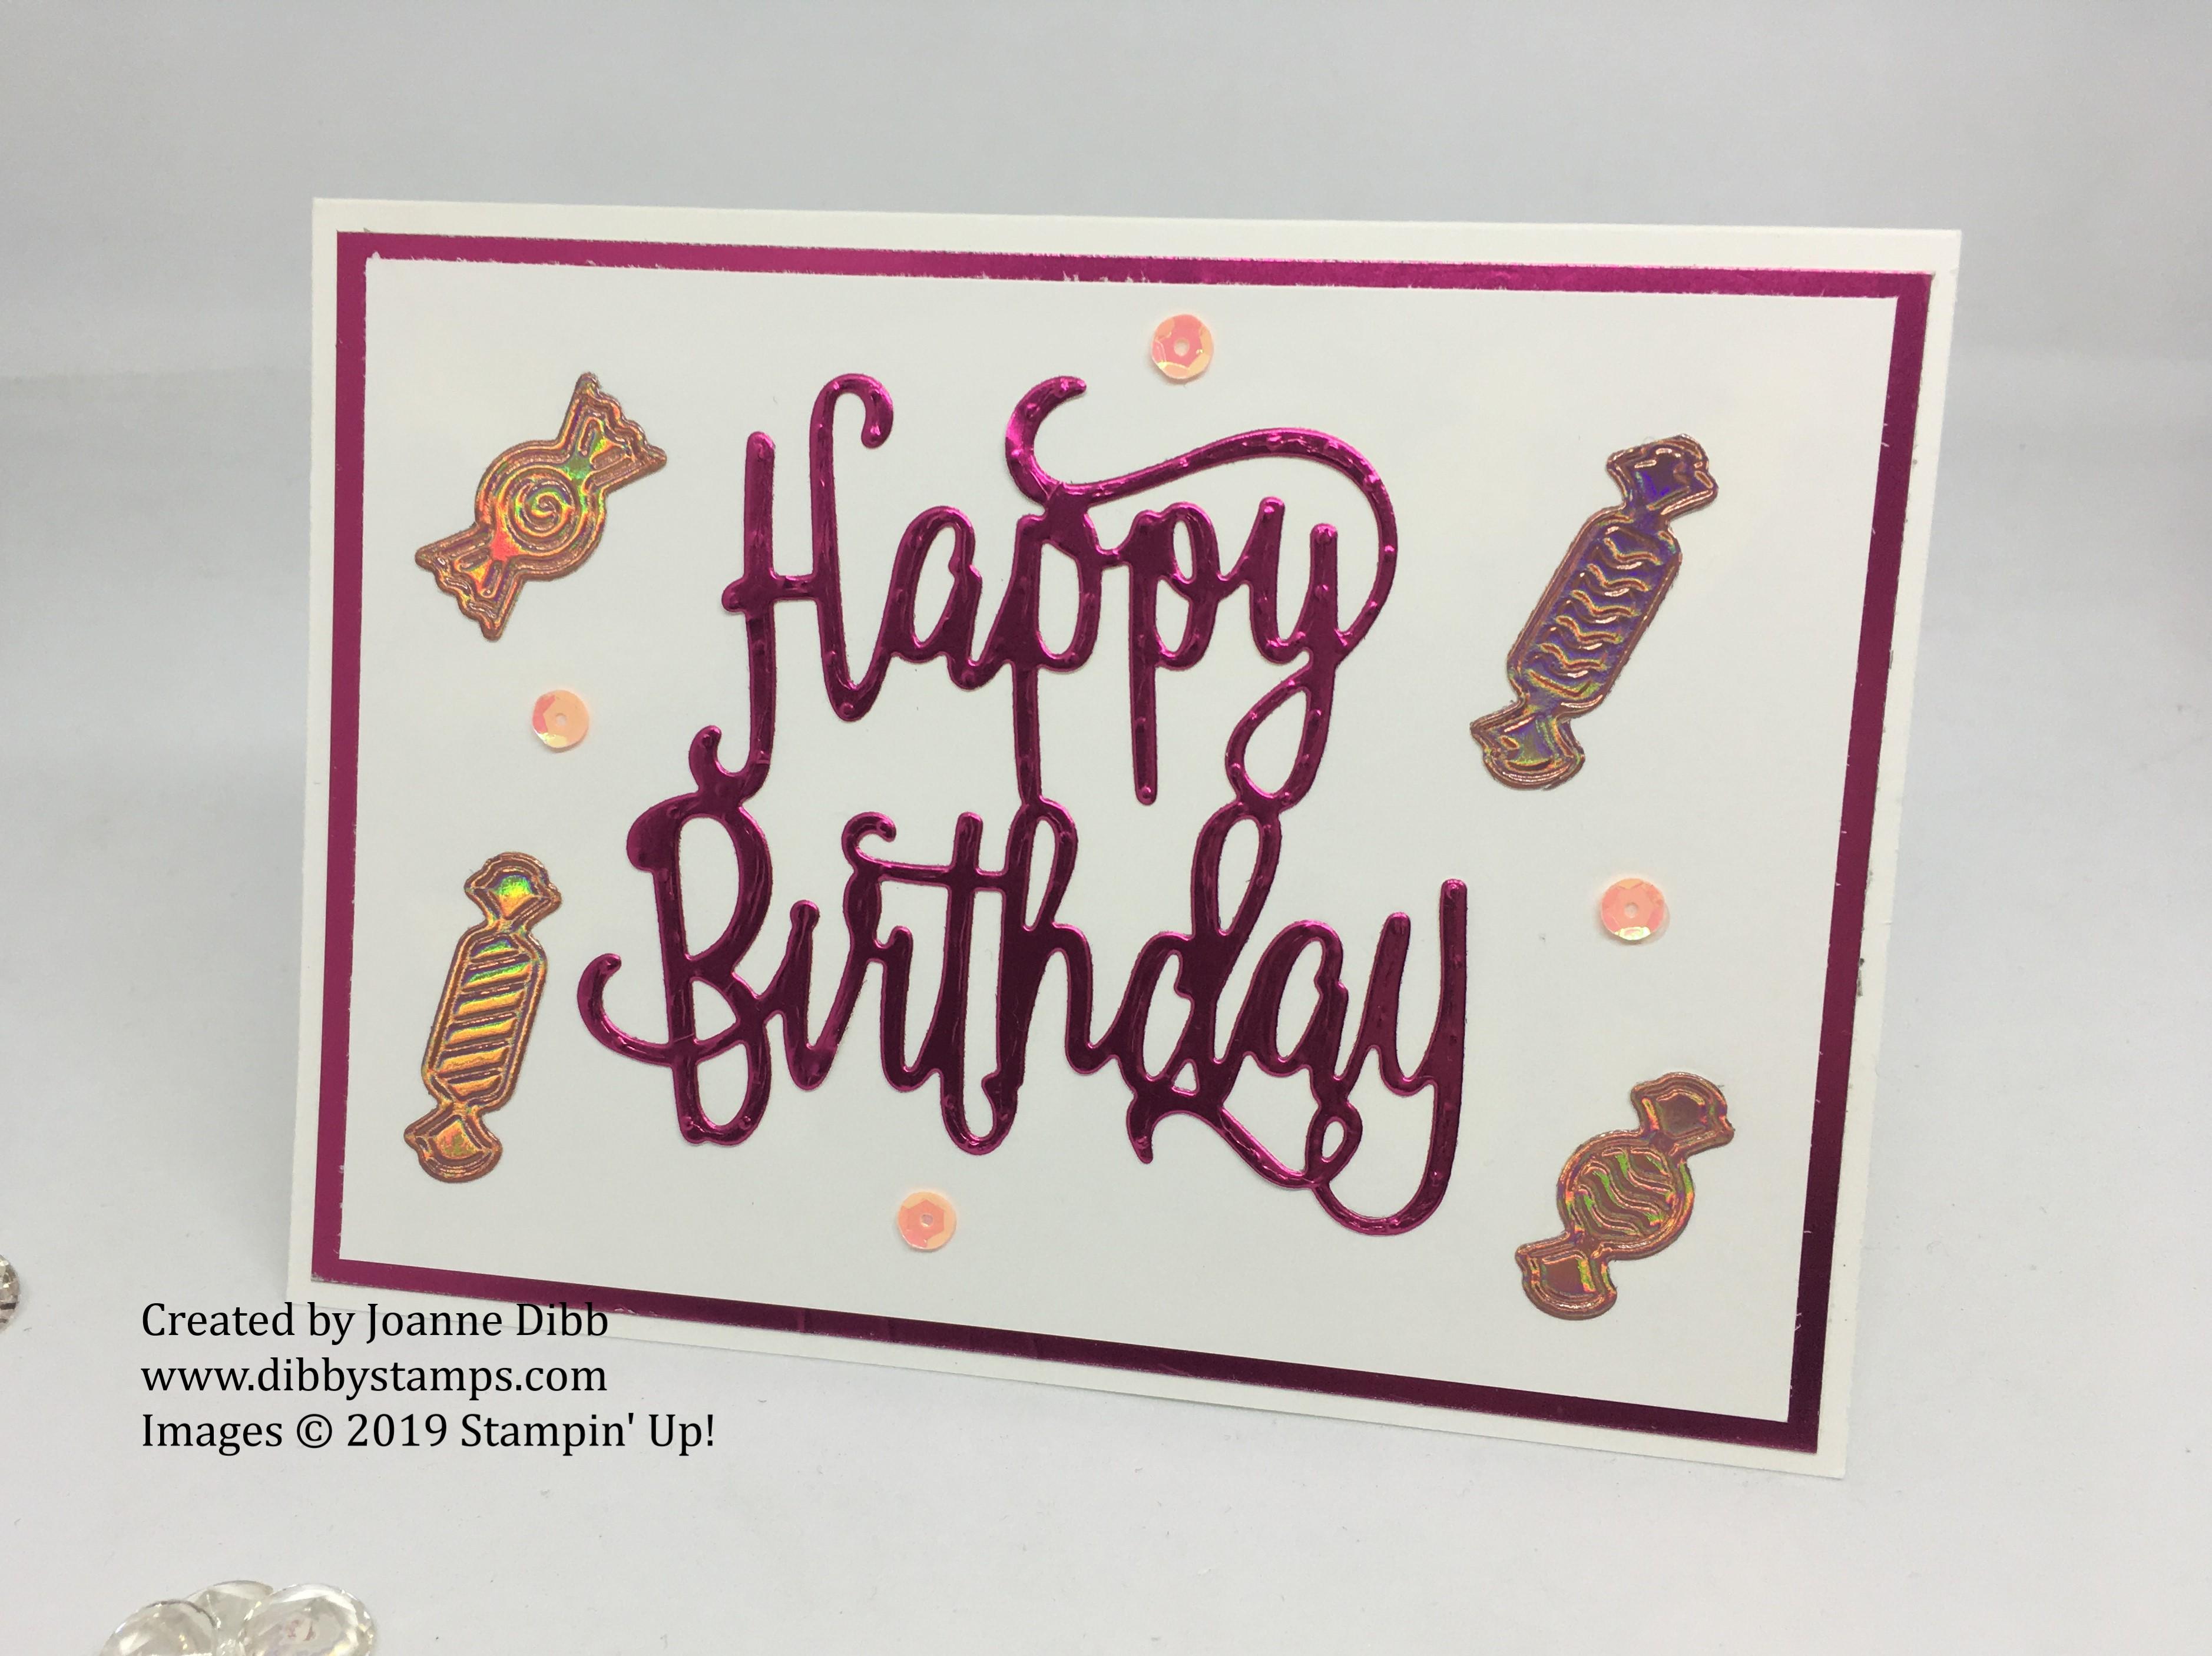 Foiled Happy Birthday Card -loveley lipstick